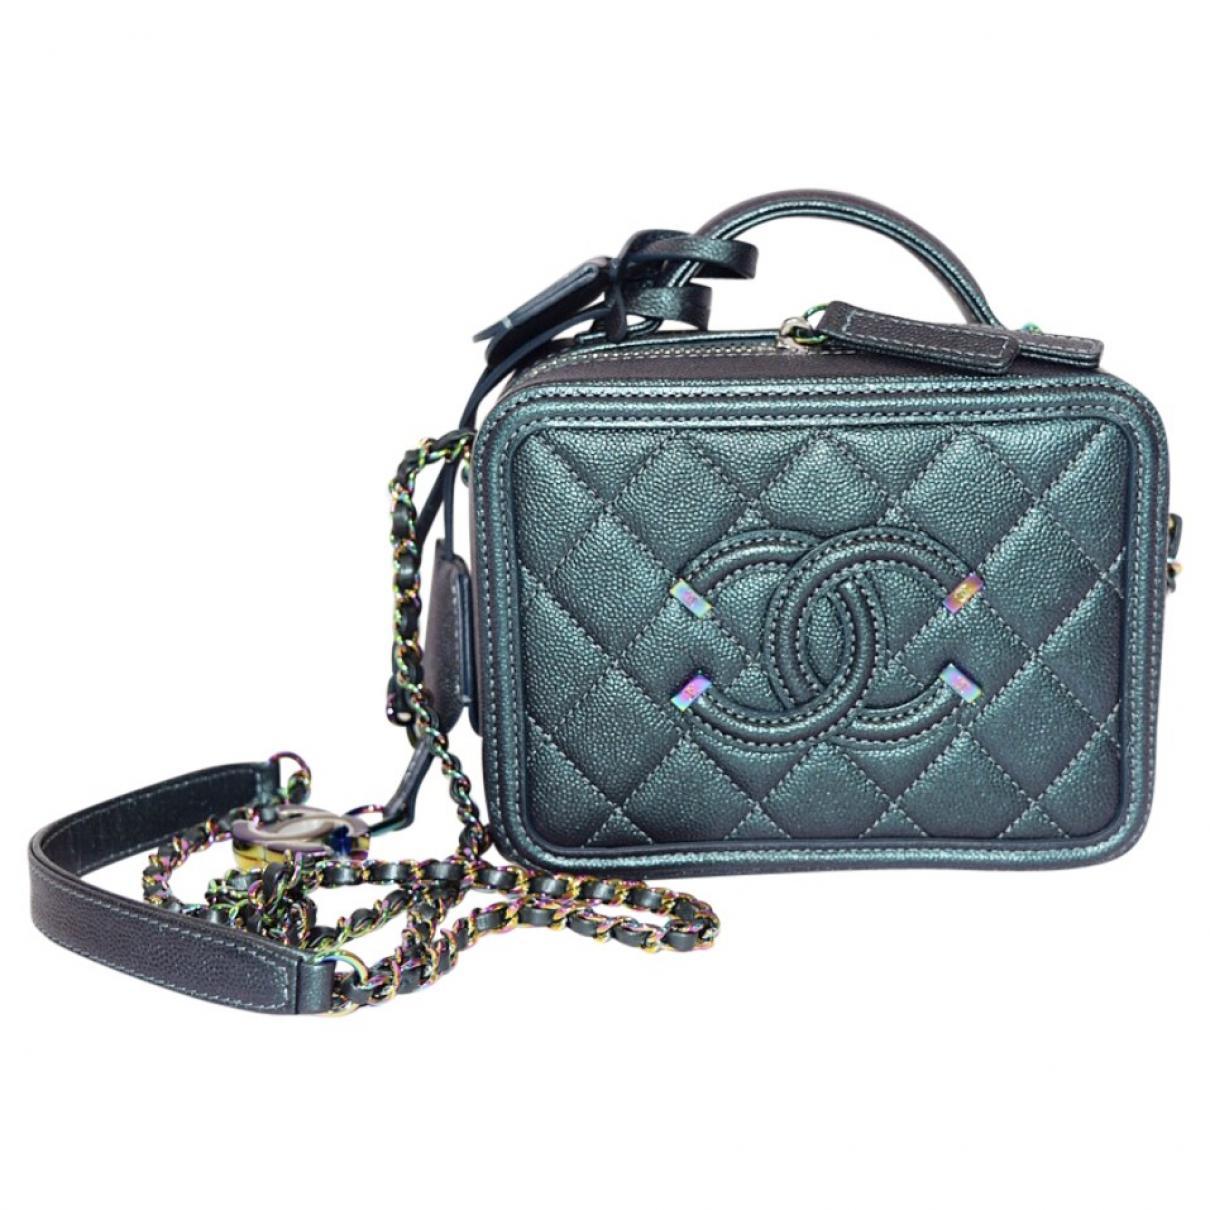 c7c50675217c Chanel. Women s Blue Vanity Turquoise Exotic Leather Handbag. £4